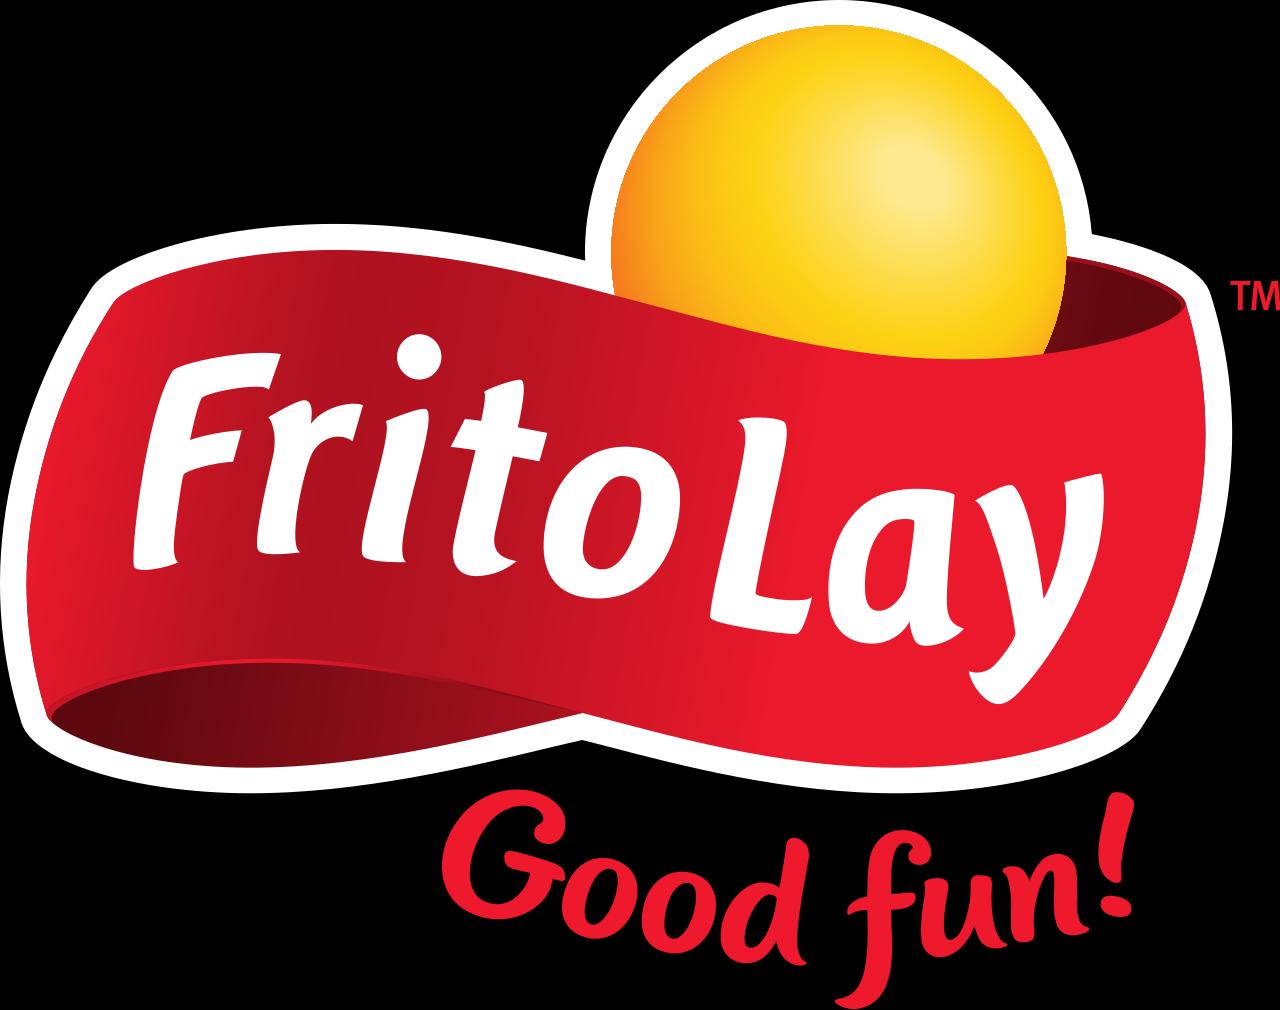 Frito-Lay